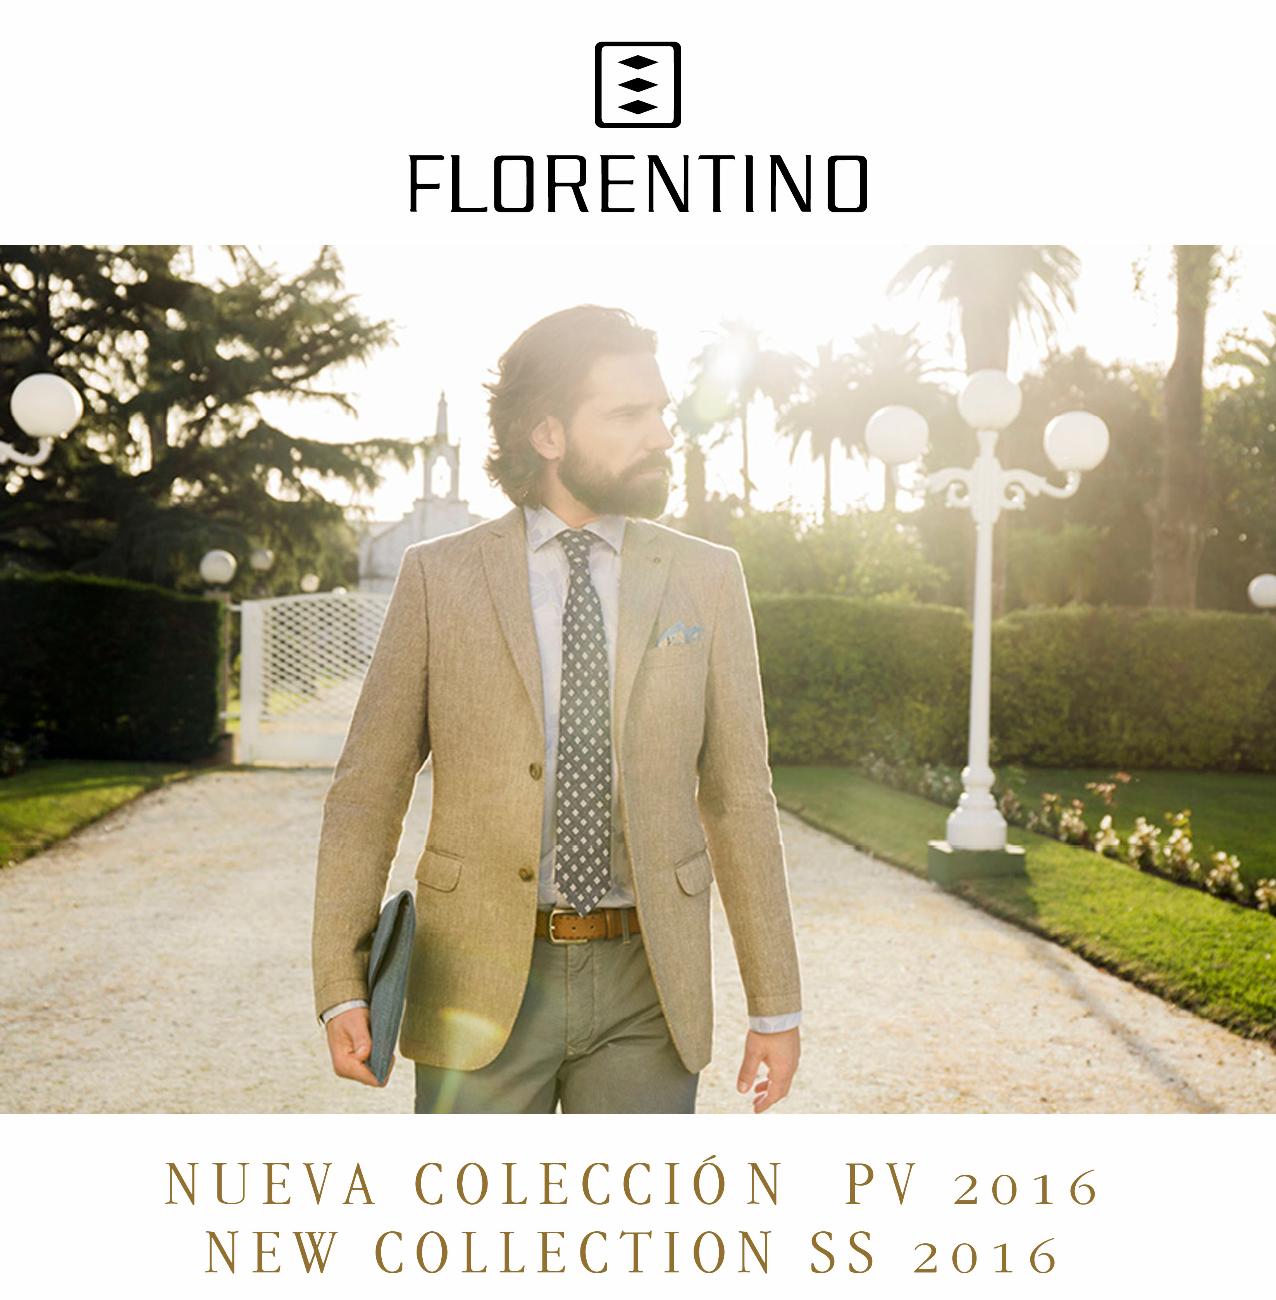 Campaña Florentino PV 2016